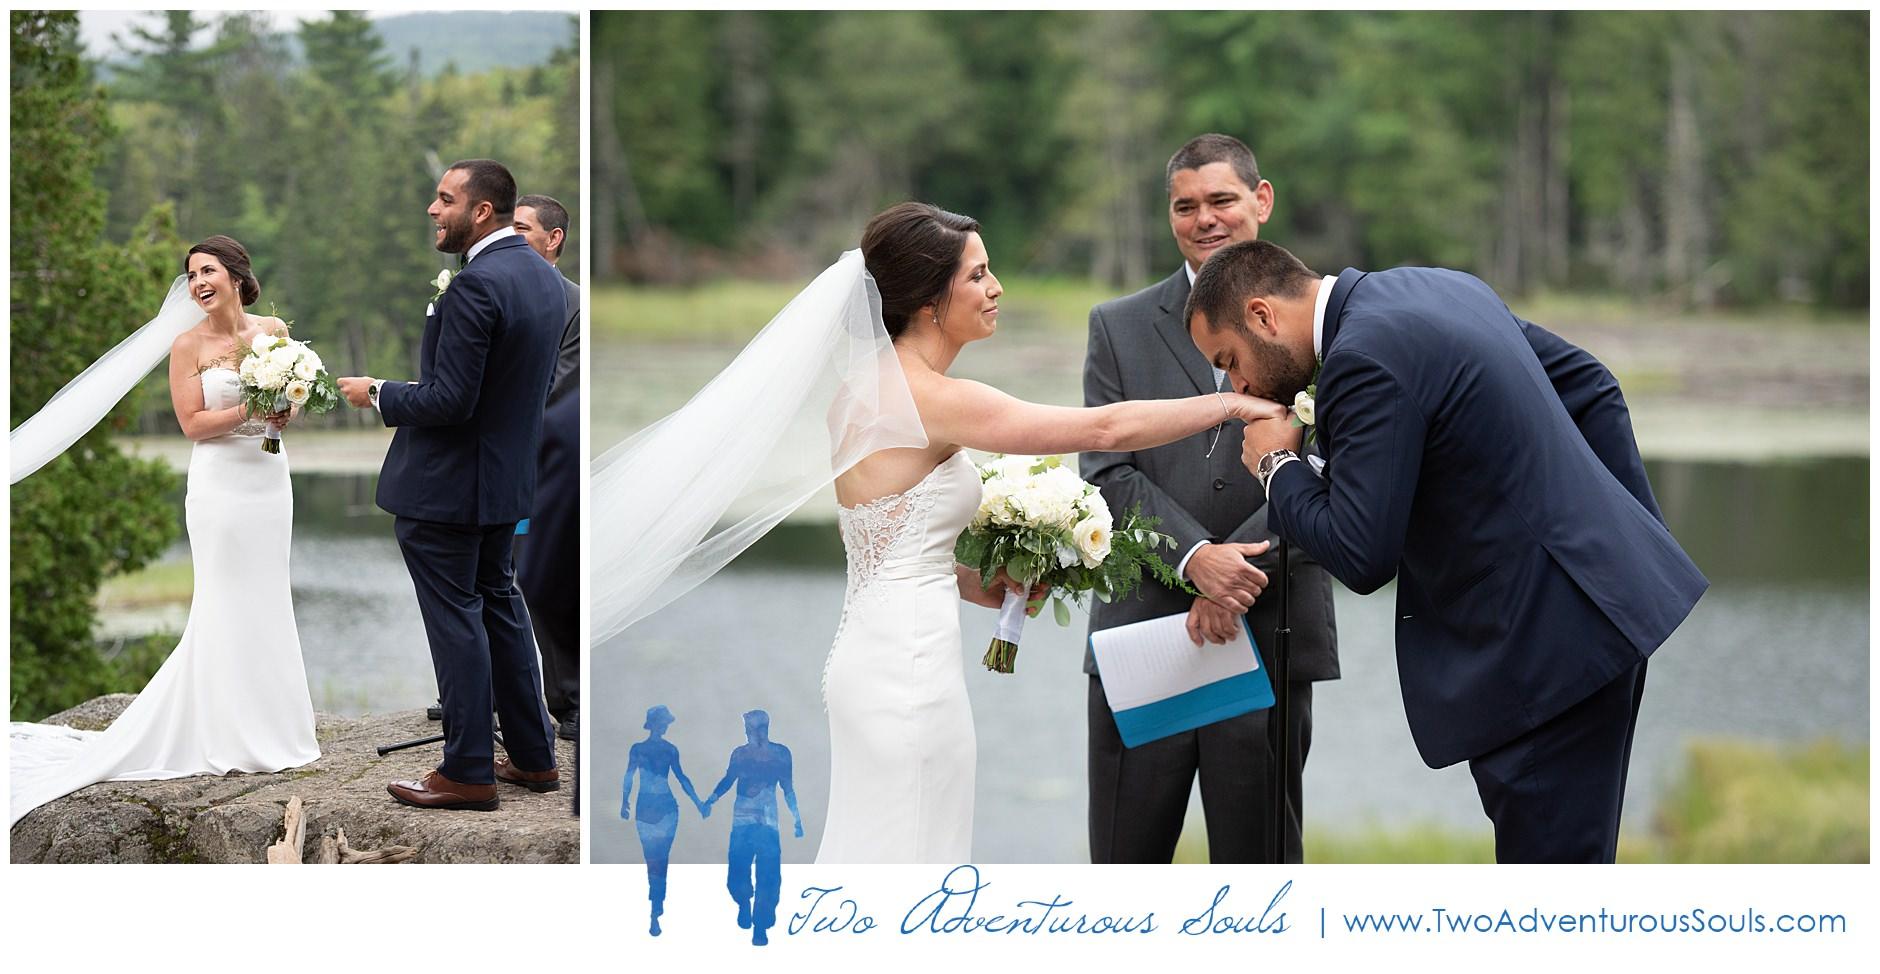 Sugarloaf Outdoor Center Wedding Photographers, Destination Wedding Photographers, Two Adventurous Souls-081719_0040.jpg